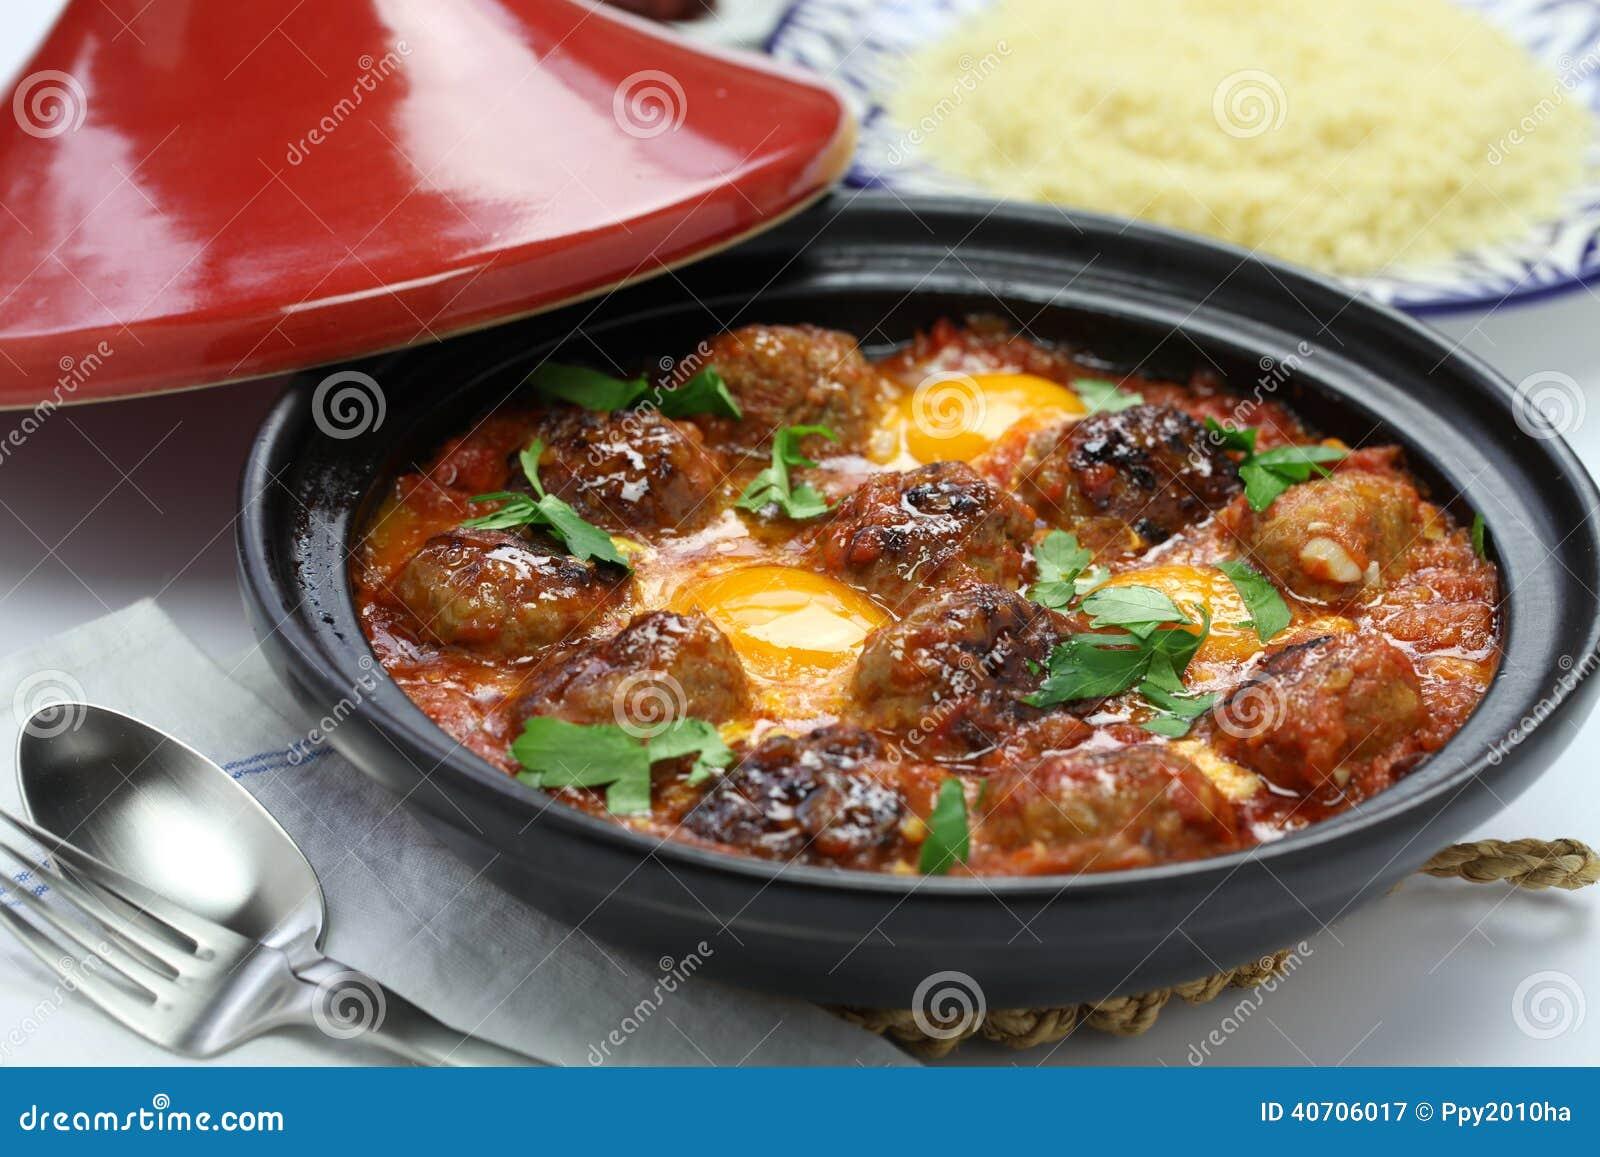 Kofta Tajine, Kefta Tagine, Moroccan Cuisine Stock Photo - Image ...